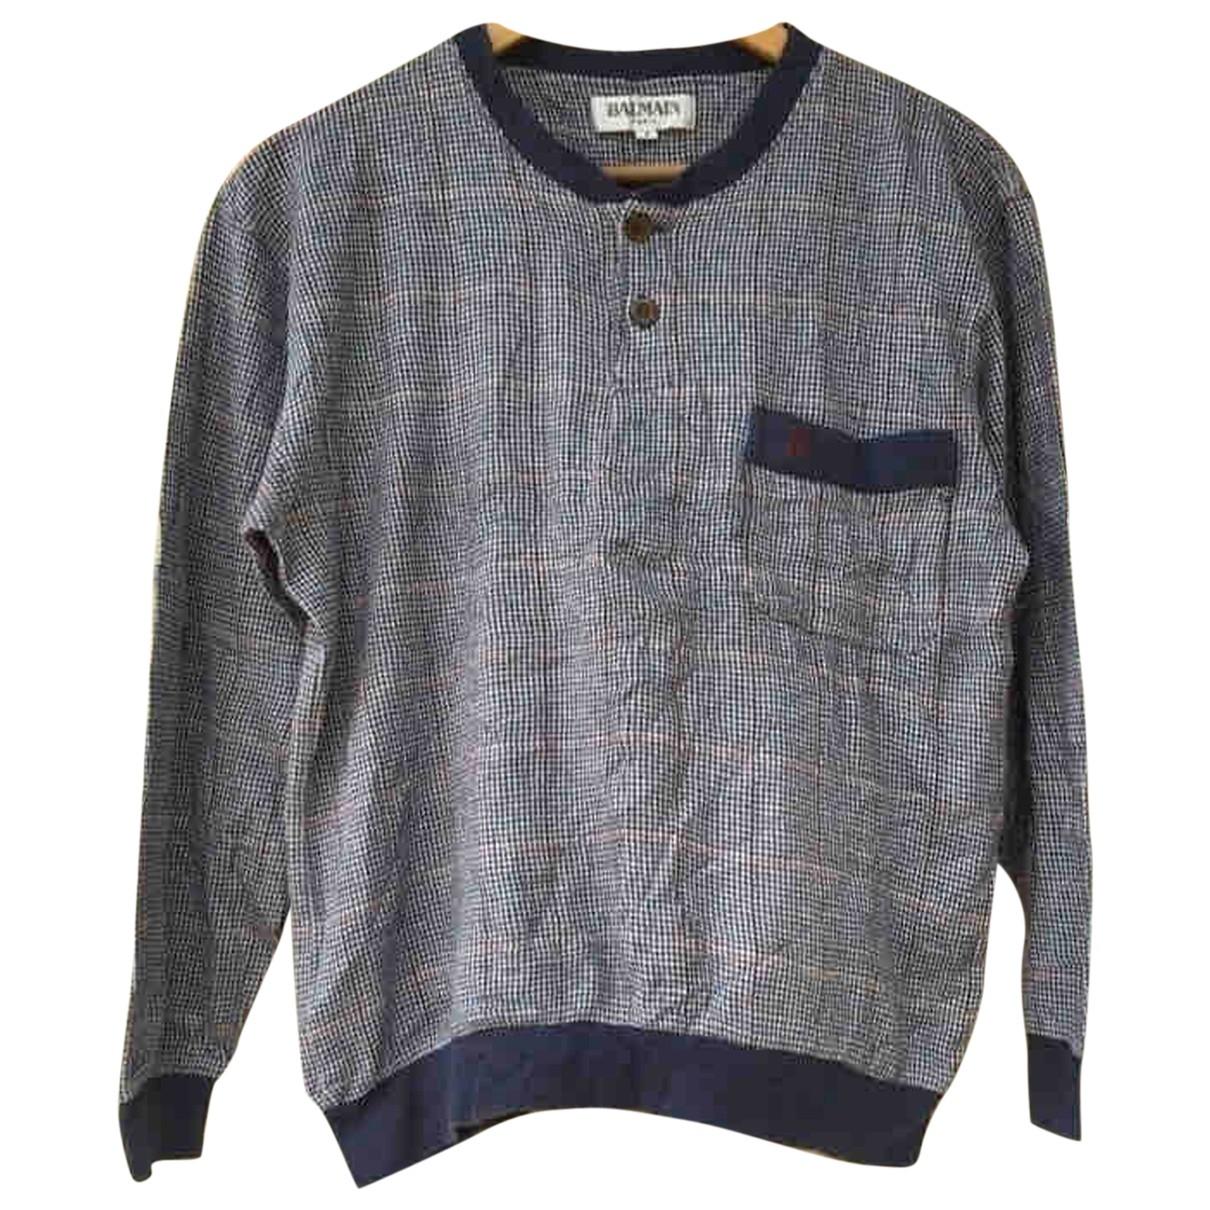 Balmain \N Grey Cotton Knitwear & Sweatshirts for Men S International